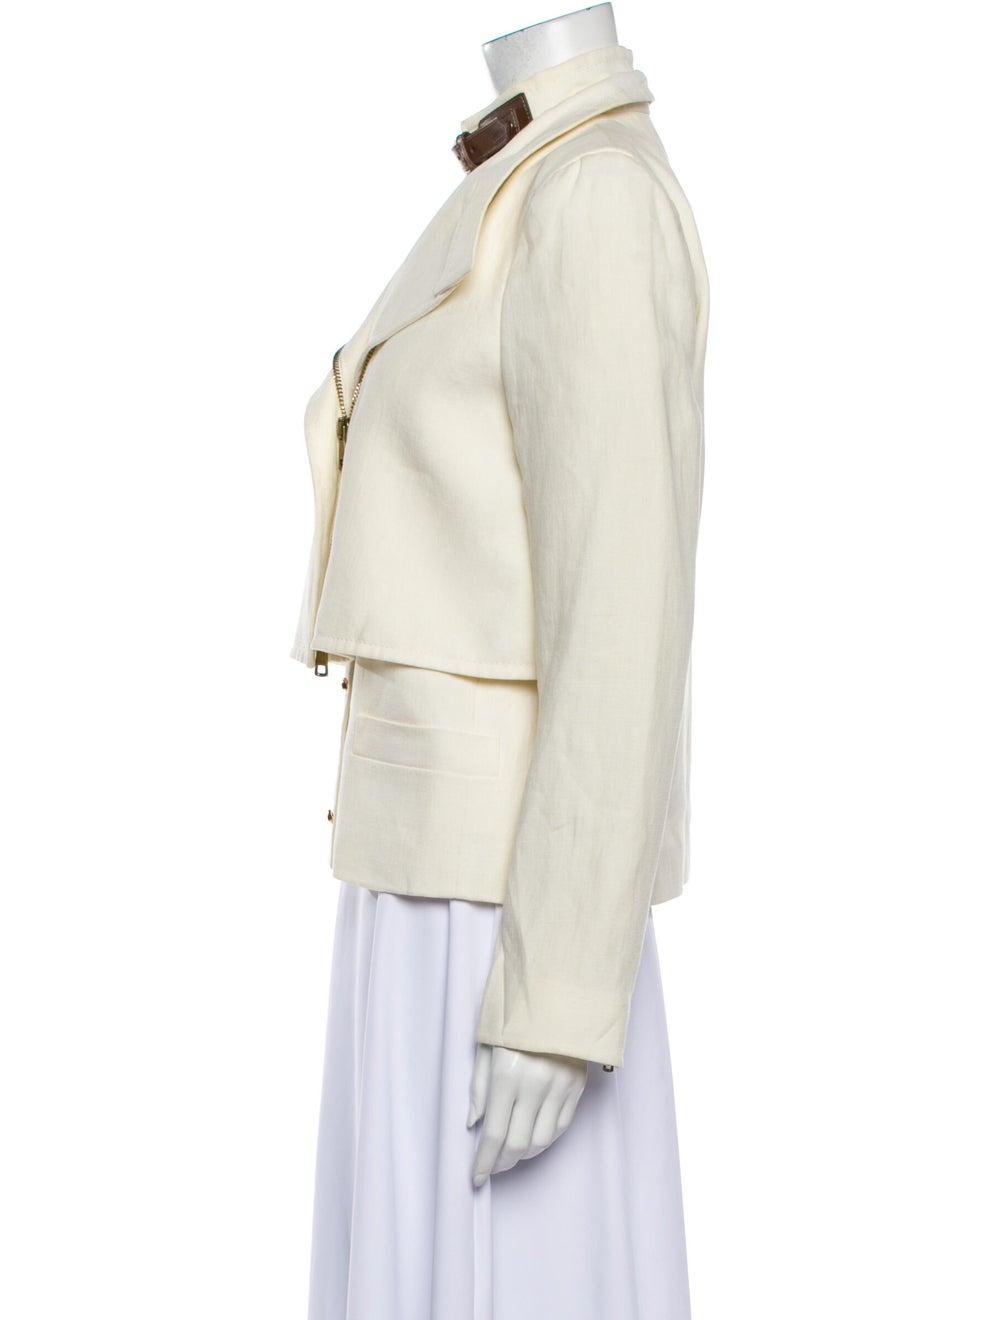 Gucci Linen Jacket - image 2